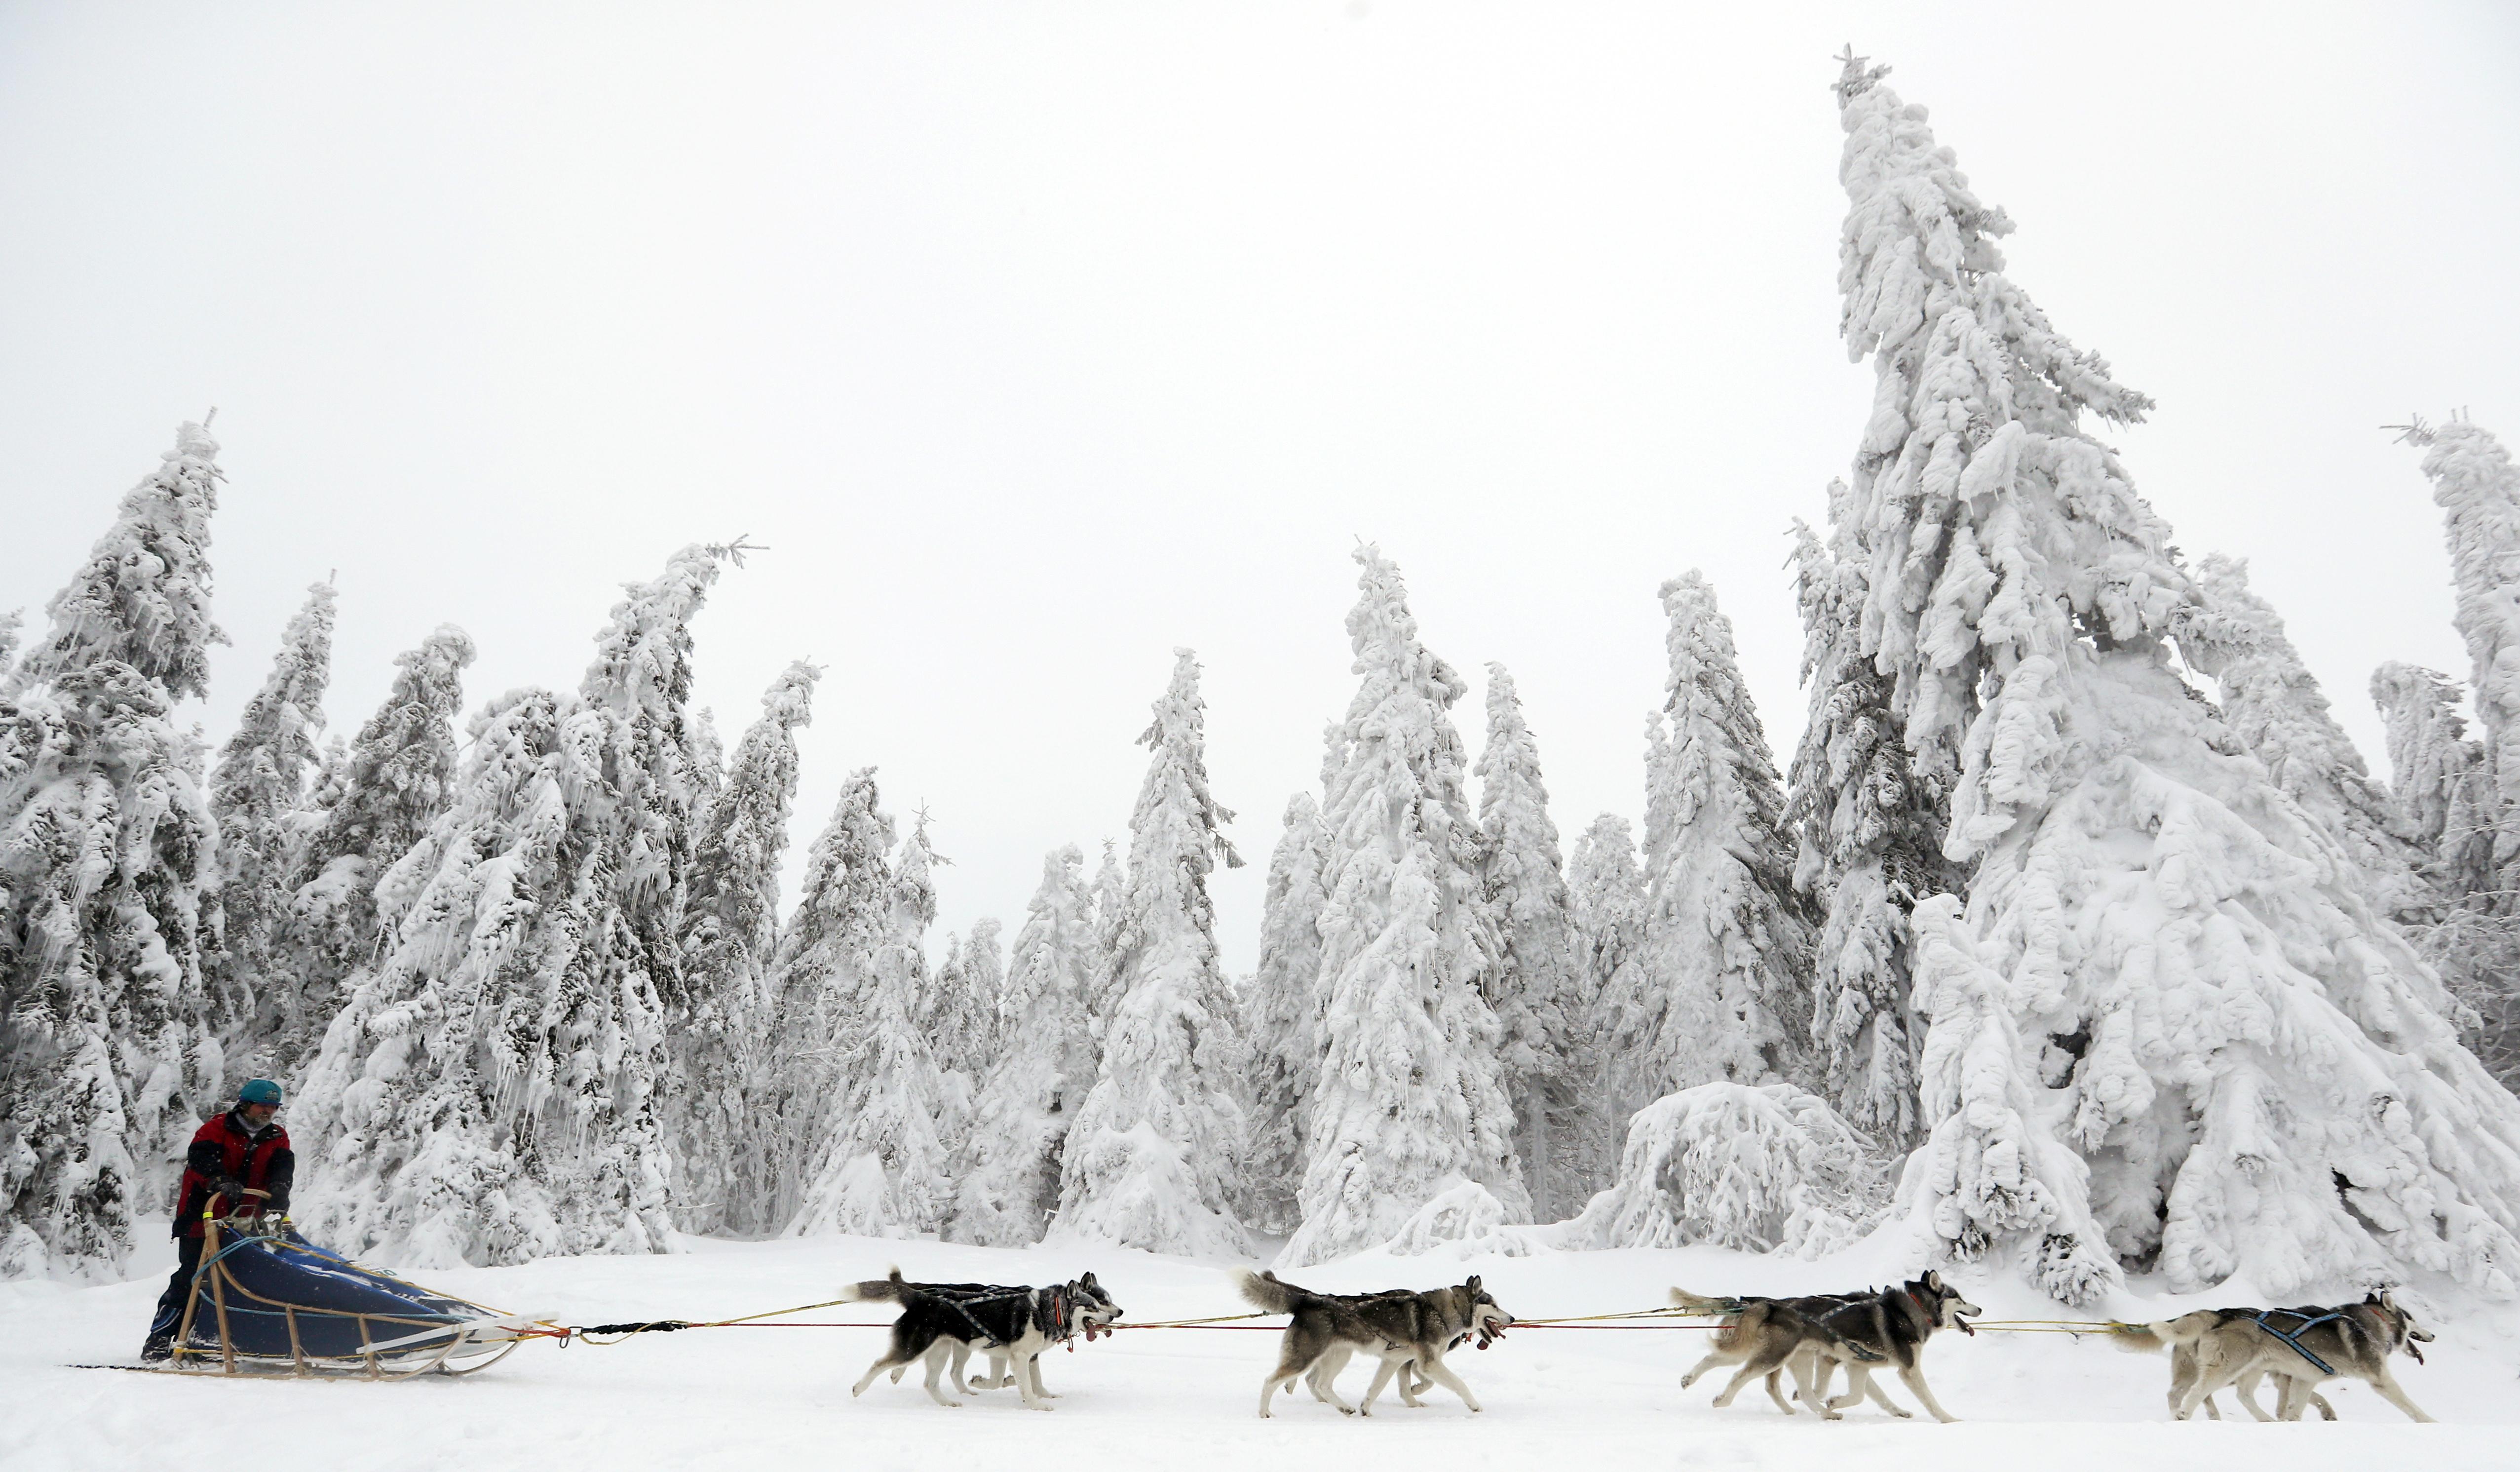 Priest Lake sled dog races set this weekend | The Spokesman